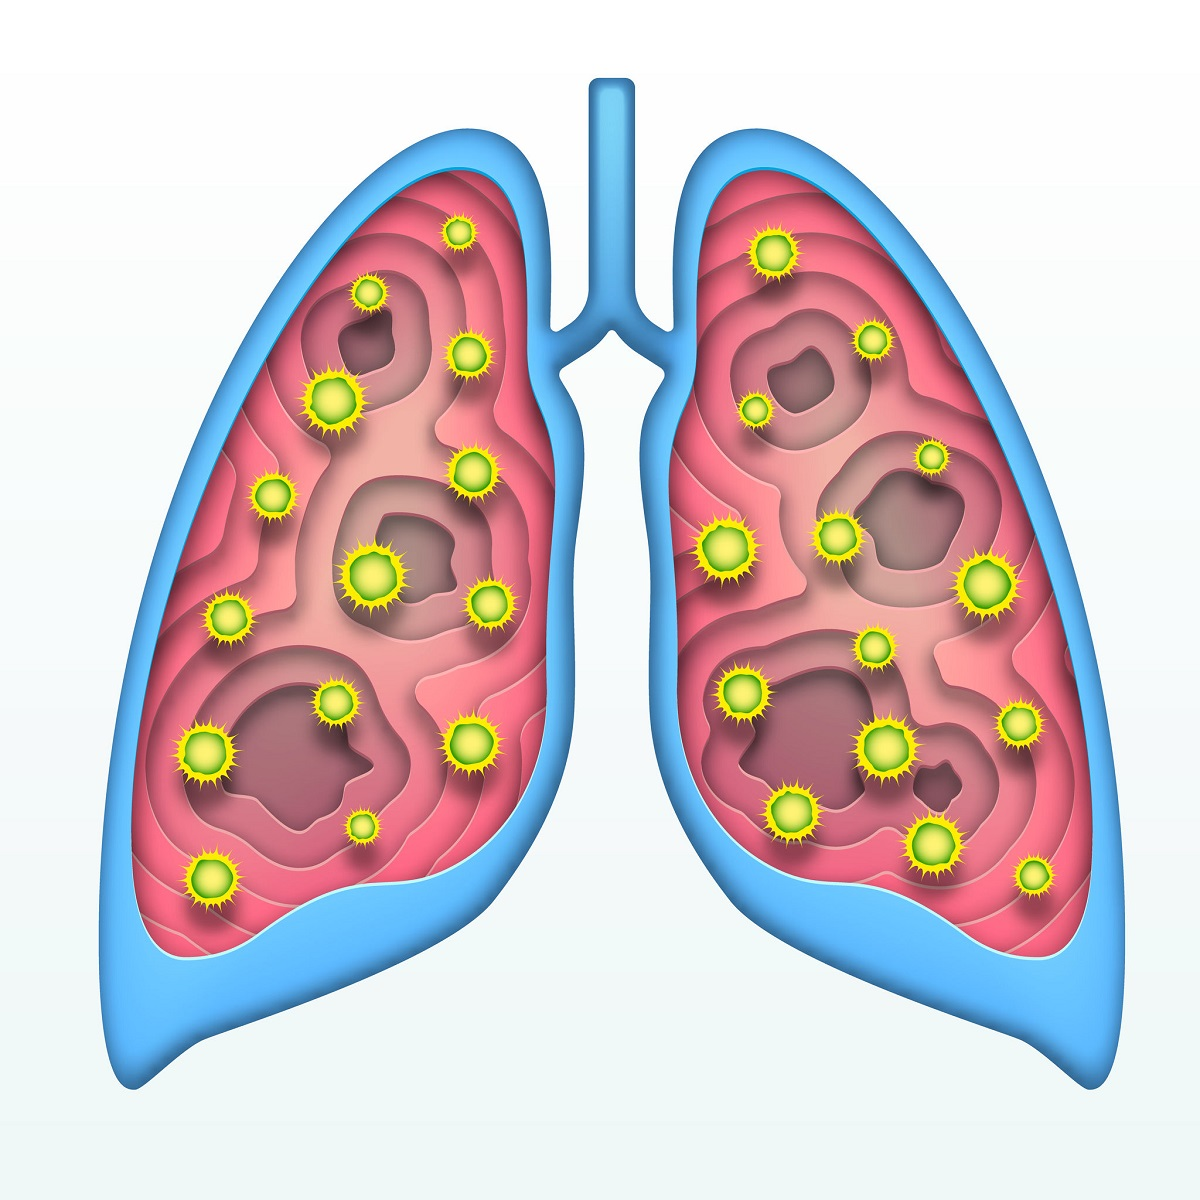 HIV 8 -  Tuberculosis (TB)